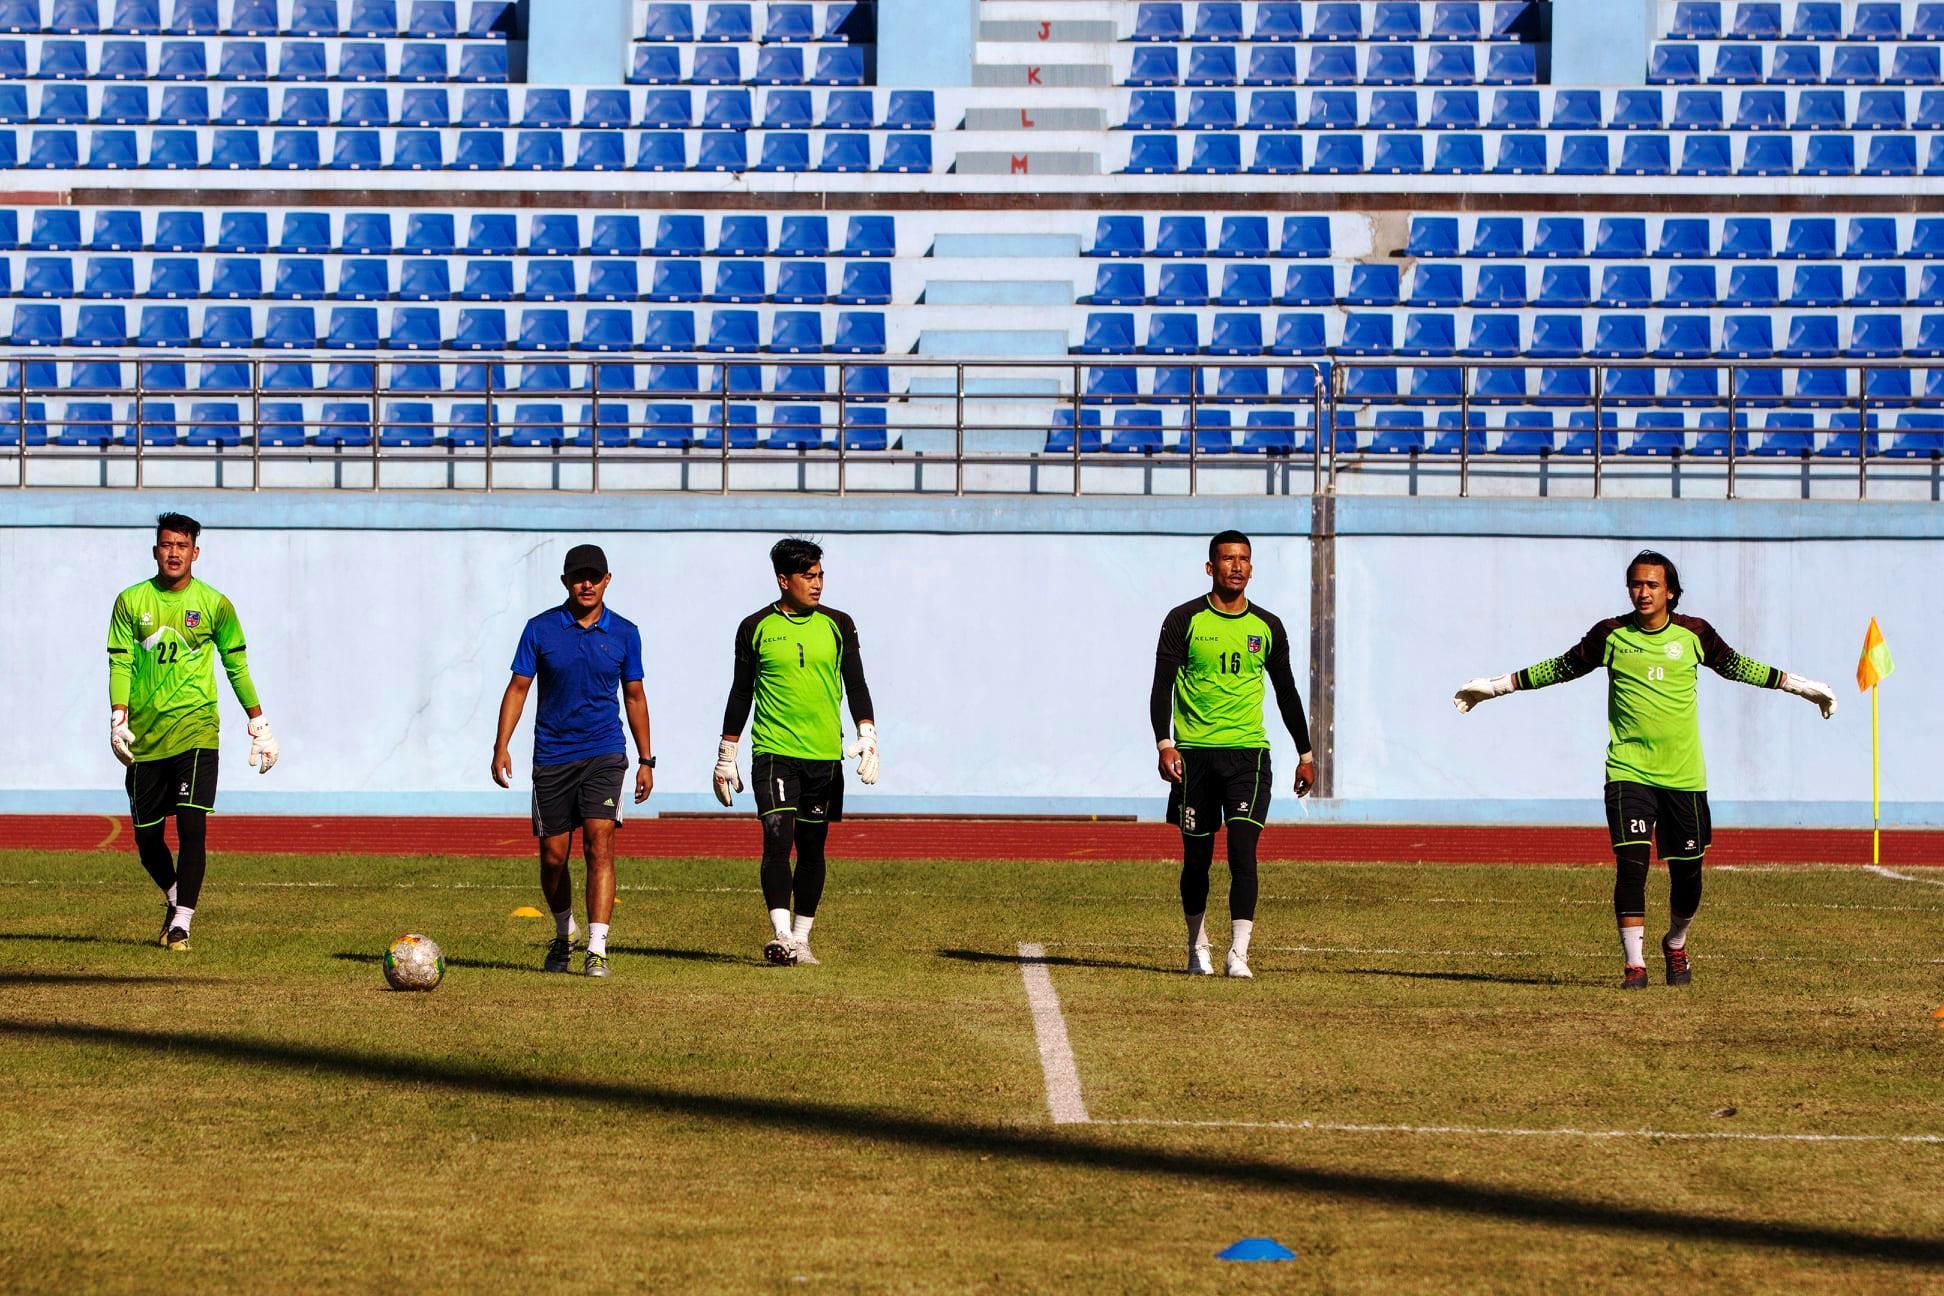 राष्ट्रिय फुटबल टोलीको प्रशिक्षण (फोटो फिचर)